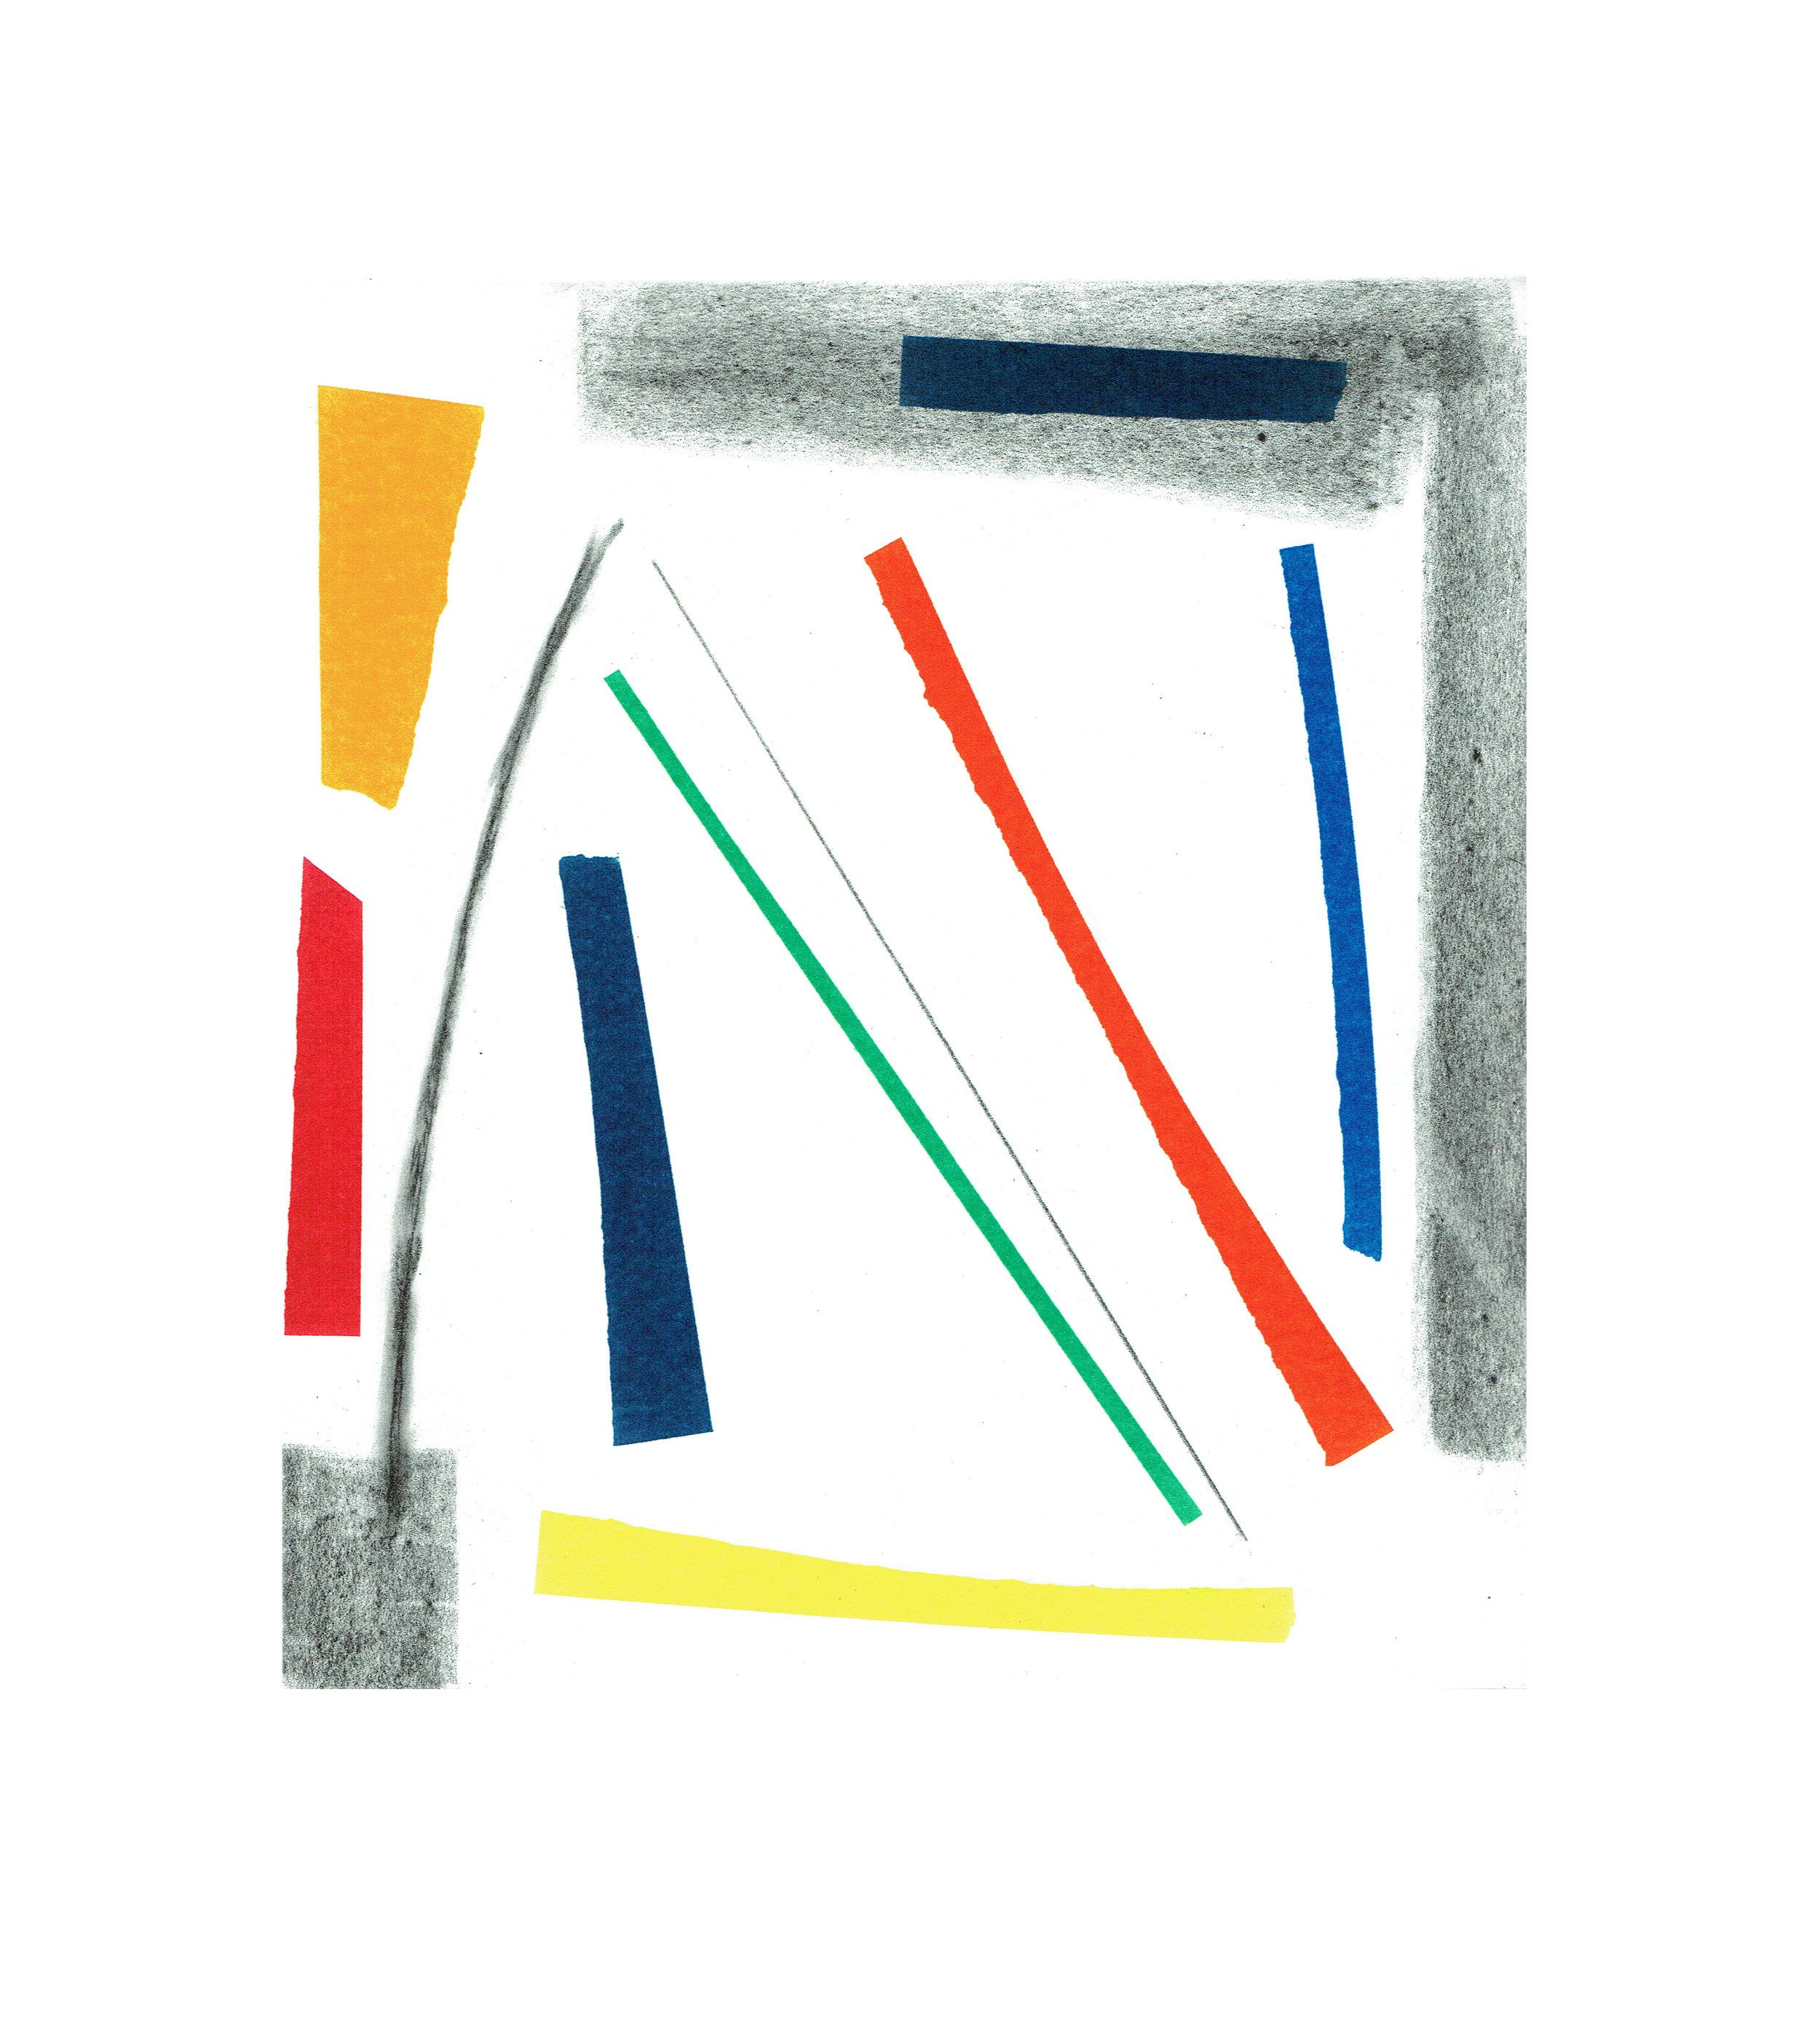 John McLean, Merry Go Round 1    Date:  2016   Size (cm - unframed):  38.2 x 34.4  Technique:   2 plate a la poupee etching   Materials:   Somerset Valvet 300gsm   Edition size:   20   Publisher:  The Print Studio   Copyright:  The Artist     POA